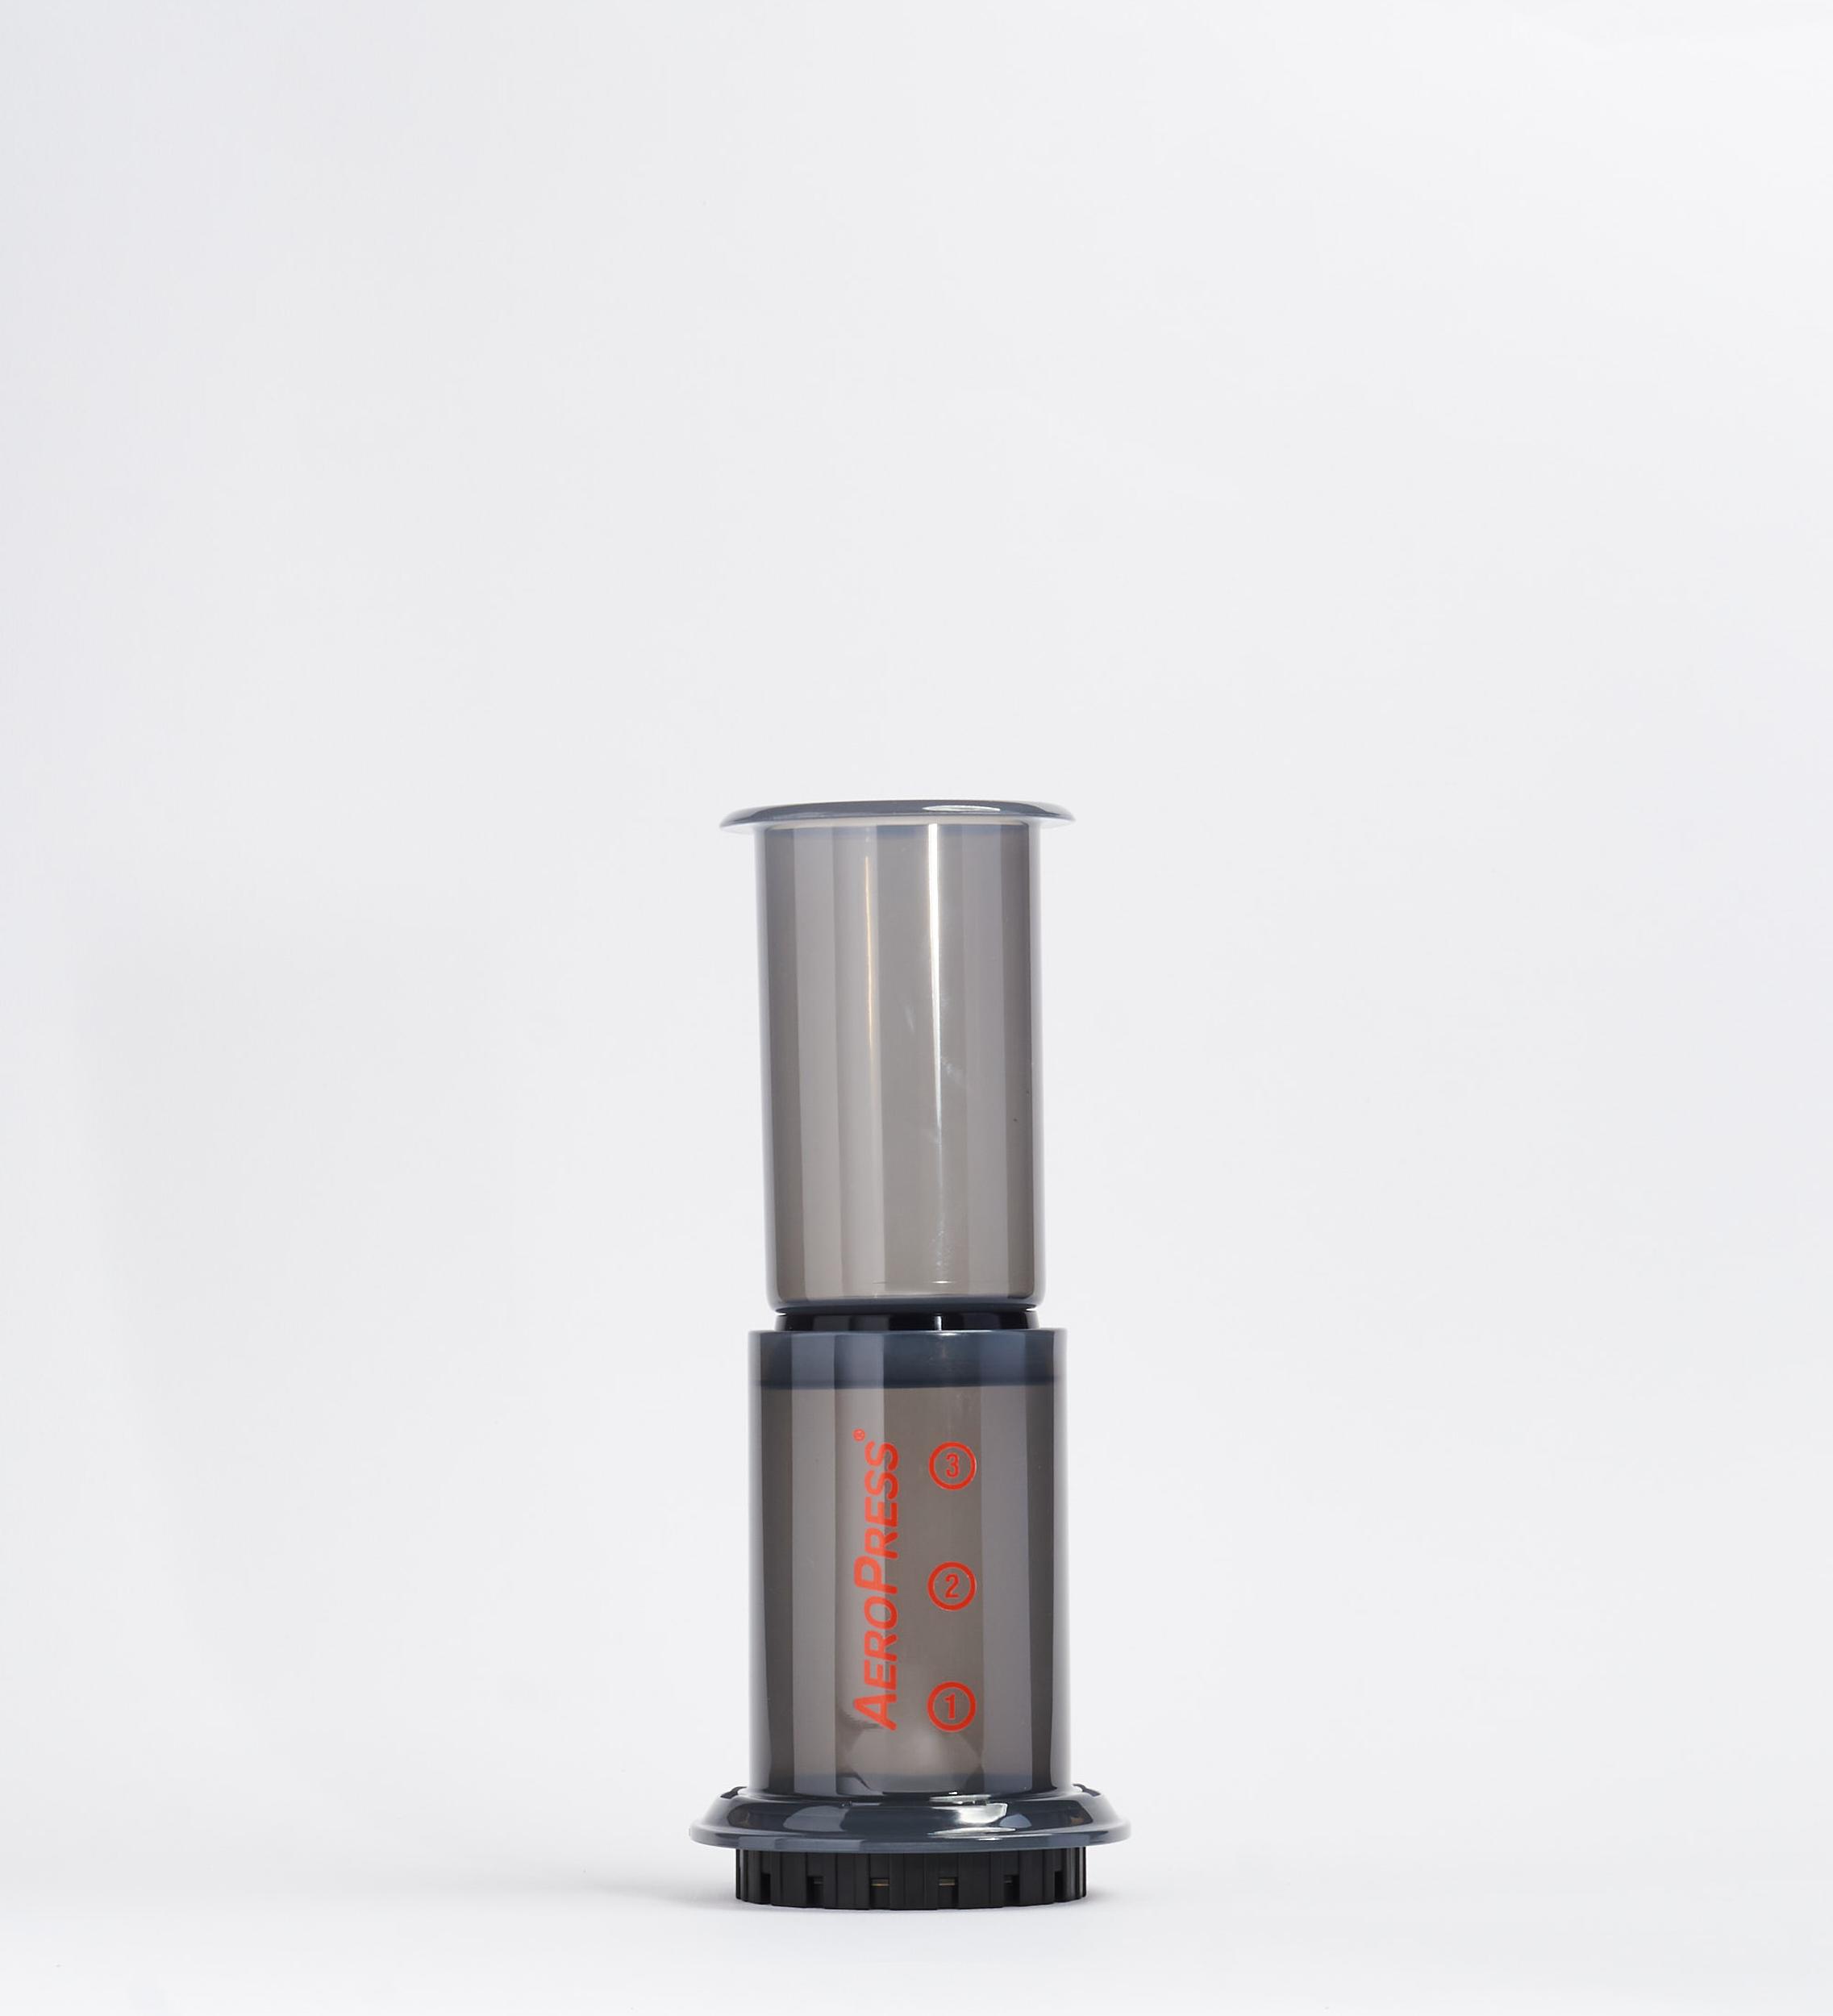 Go Coffee Maker-prev-4